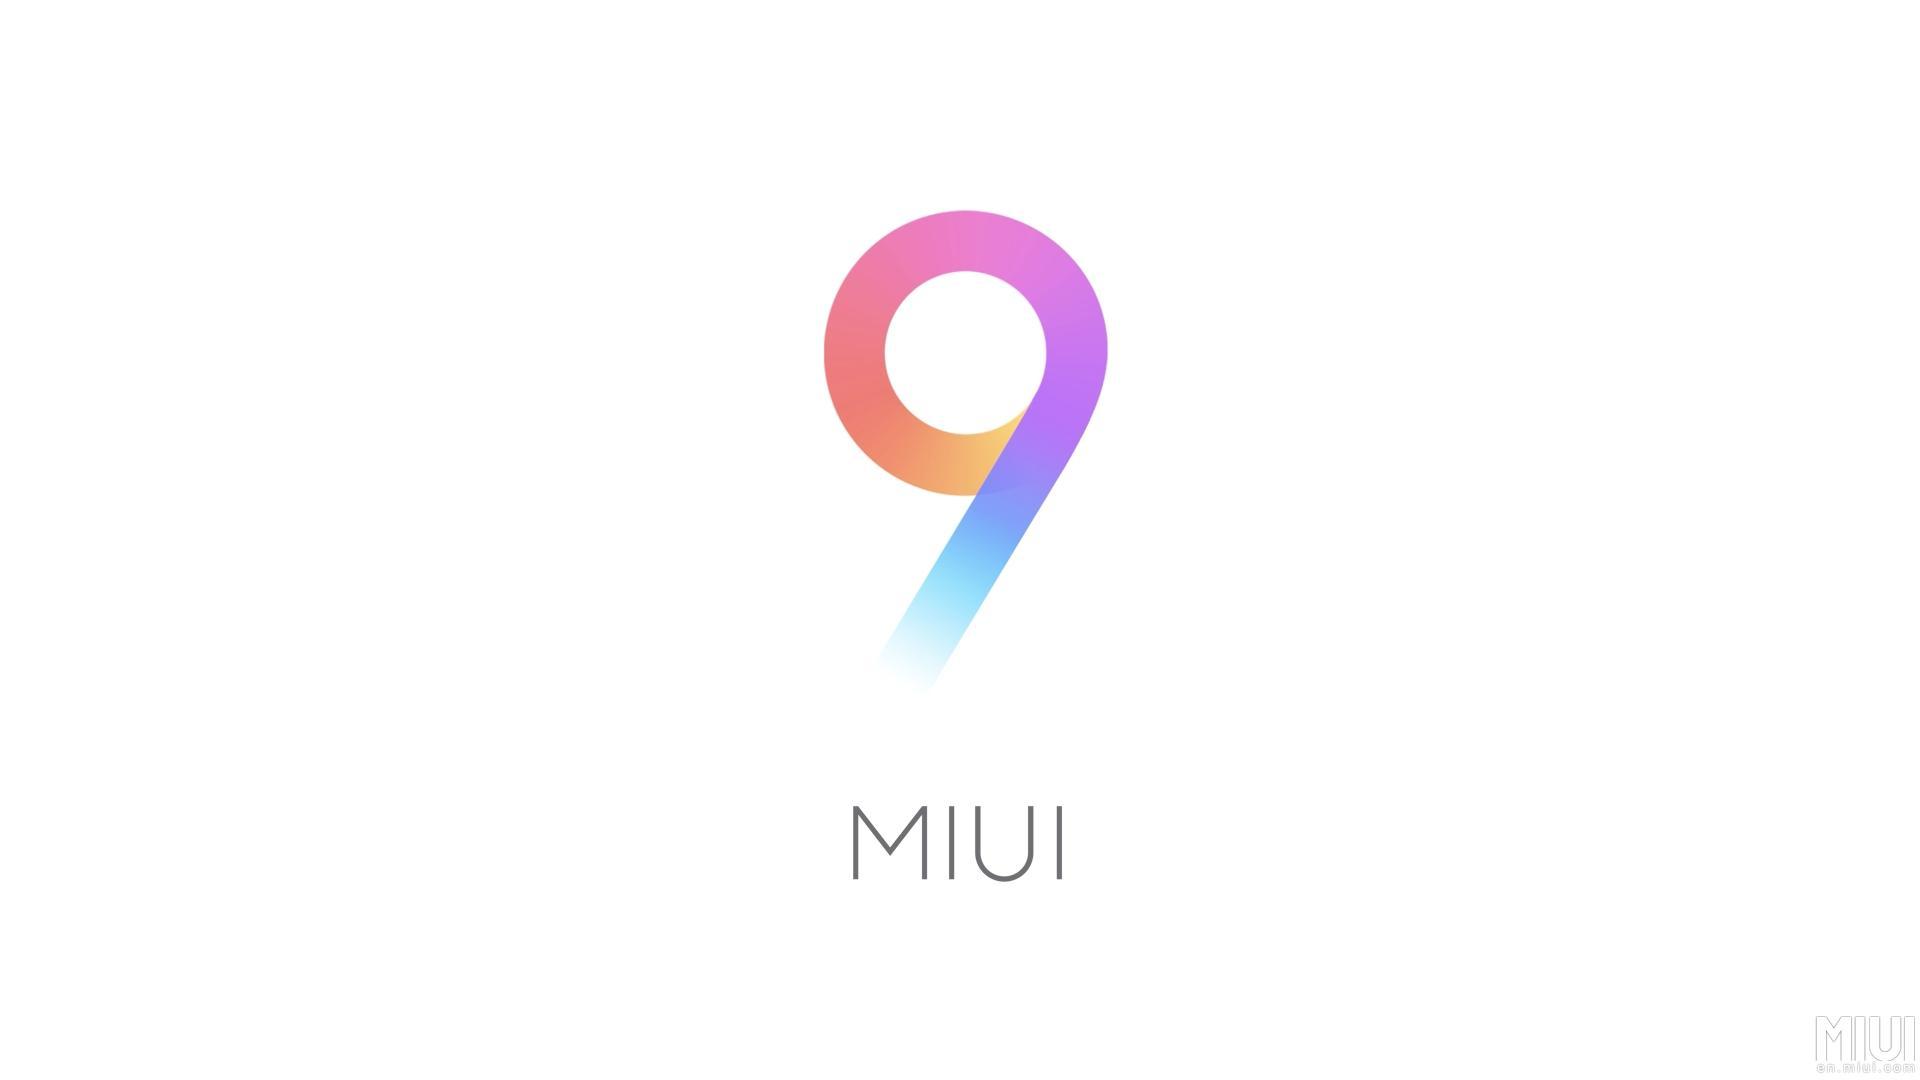 Ссылки на прошивку MIUI 9 Global Stable V9.1.2.0.NBDMIEI для Xiaomi Mi Max Prime